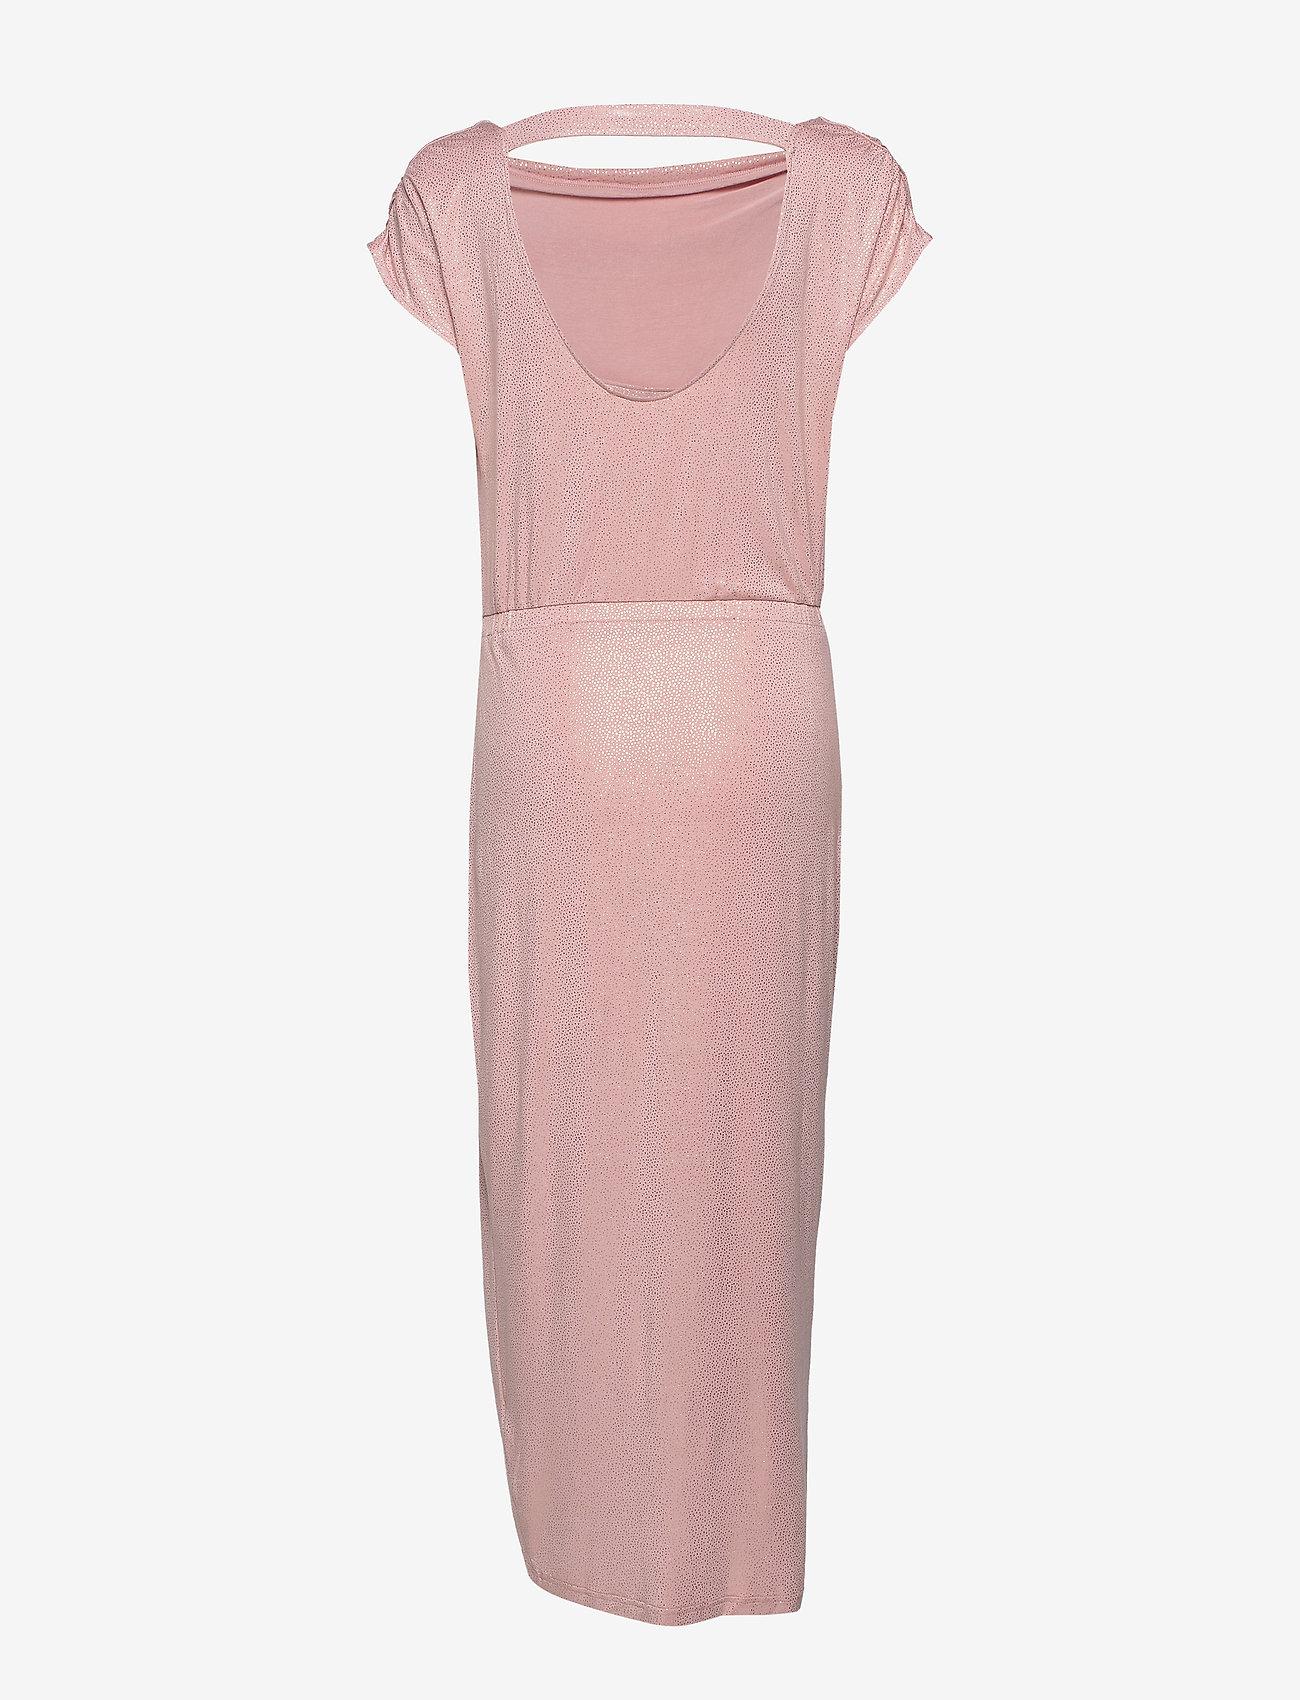 Rosemunde Dress ss - Sukienki POWDER ROSE SHIMMERING DOTS - Kobiety Odzież.